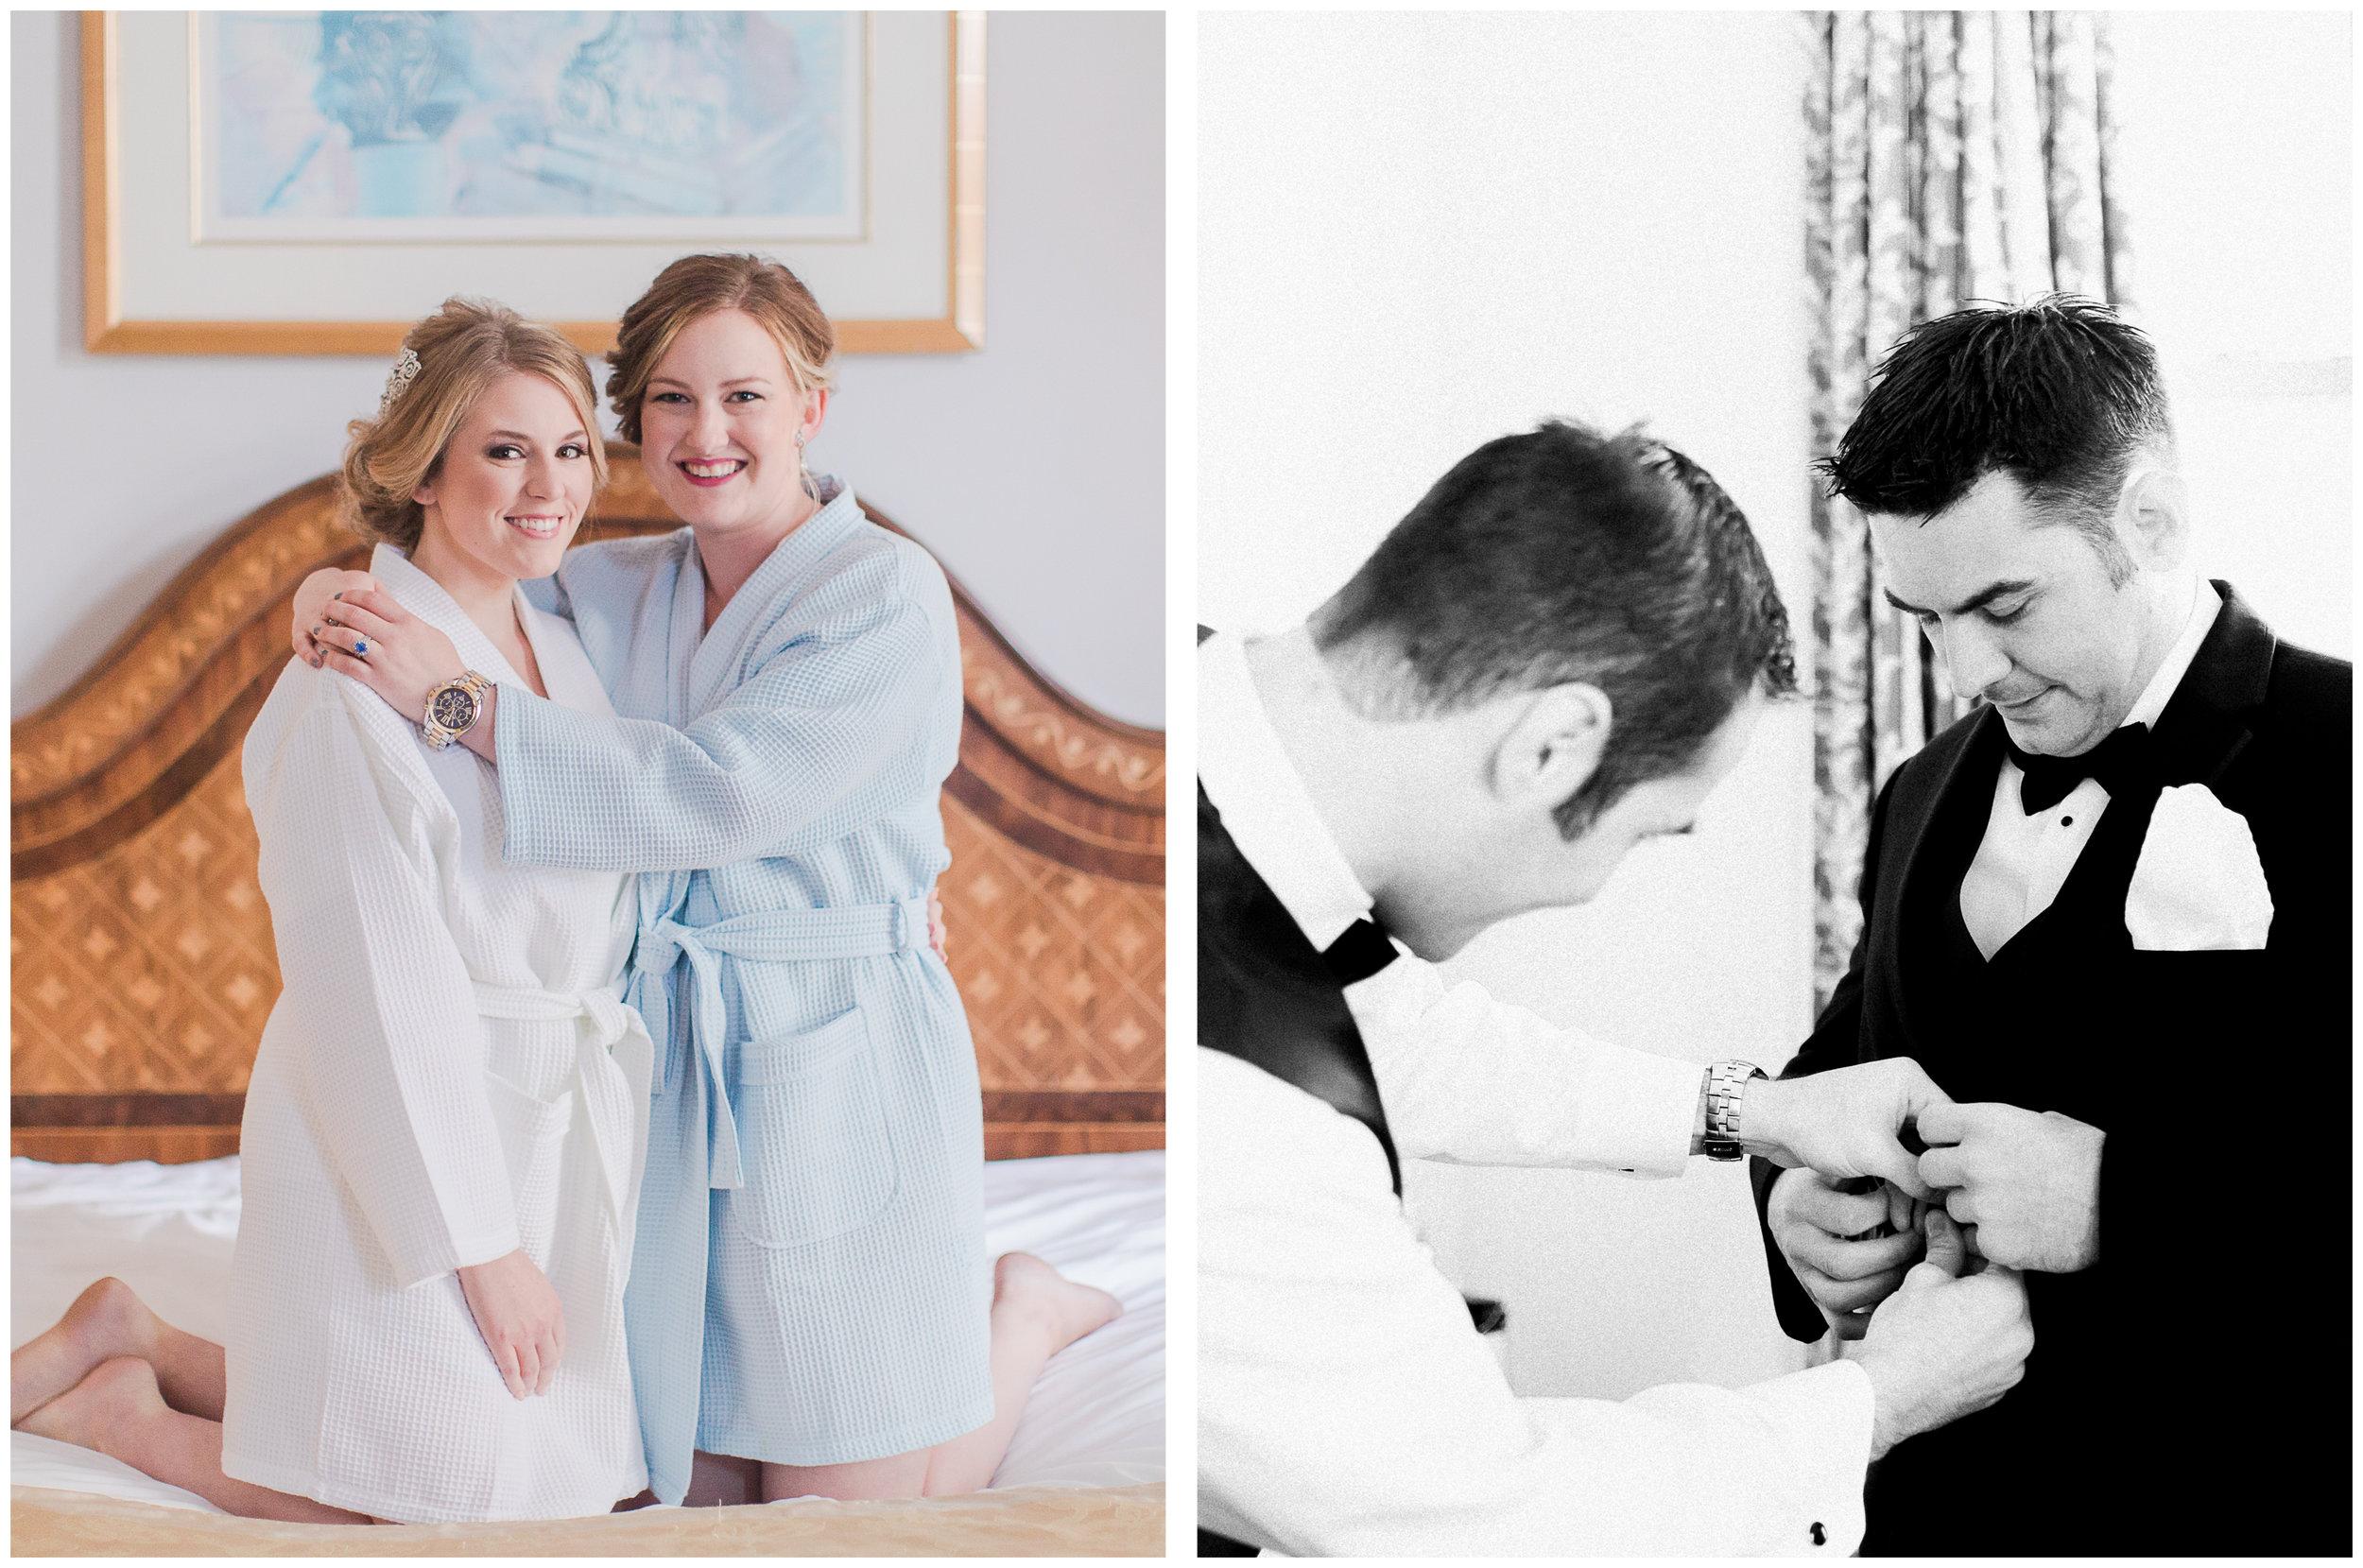 Bonphotage Wedding Photographer